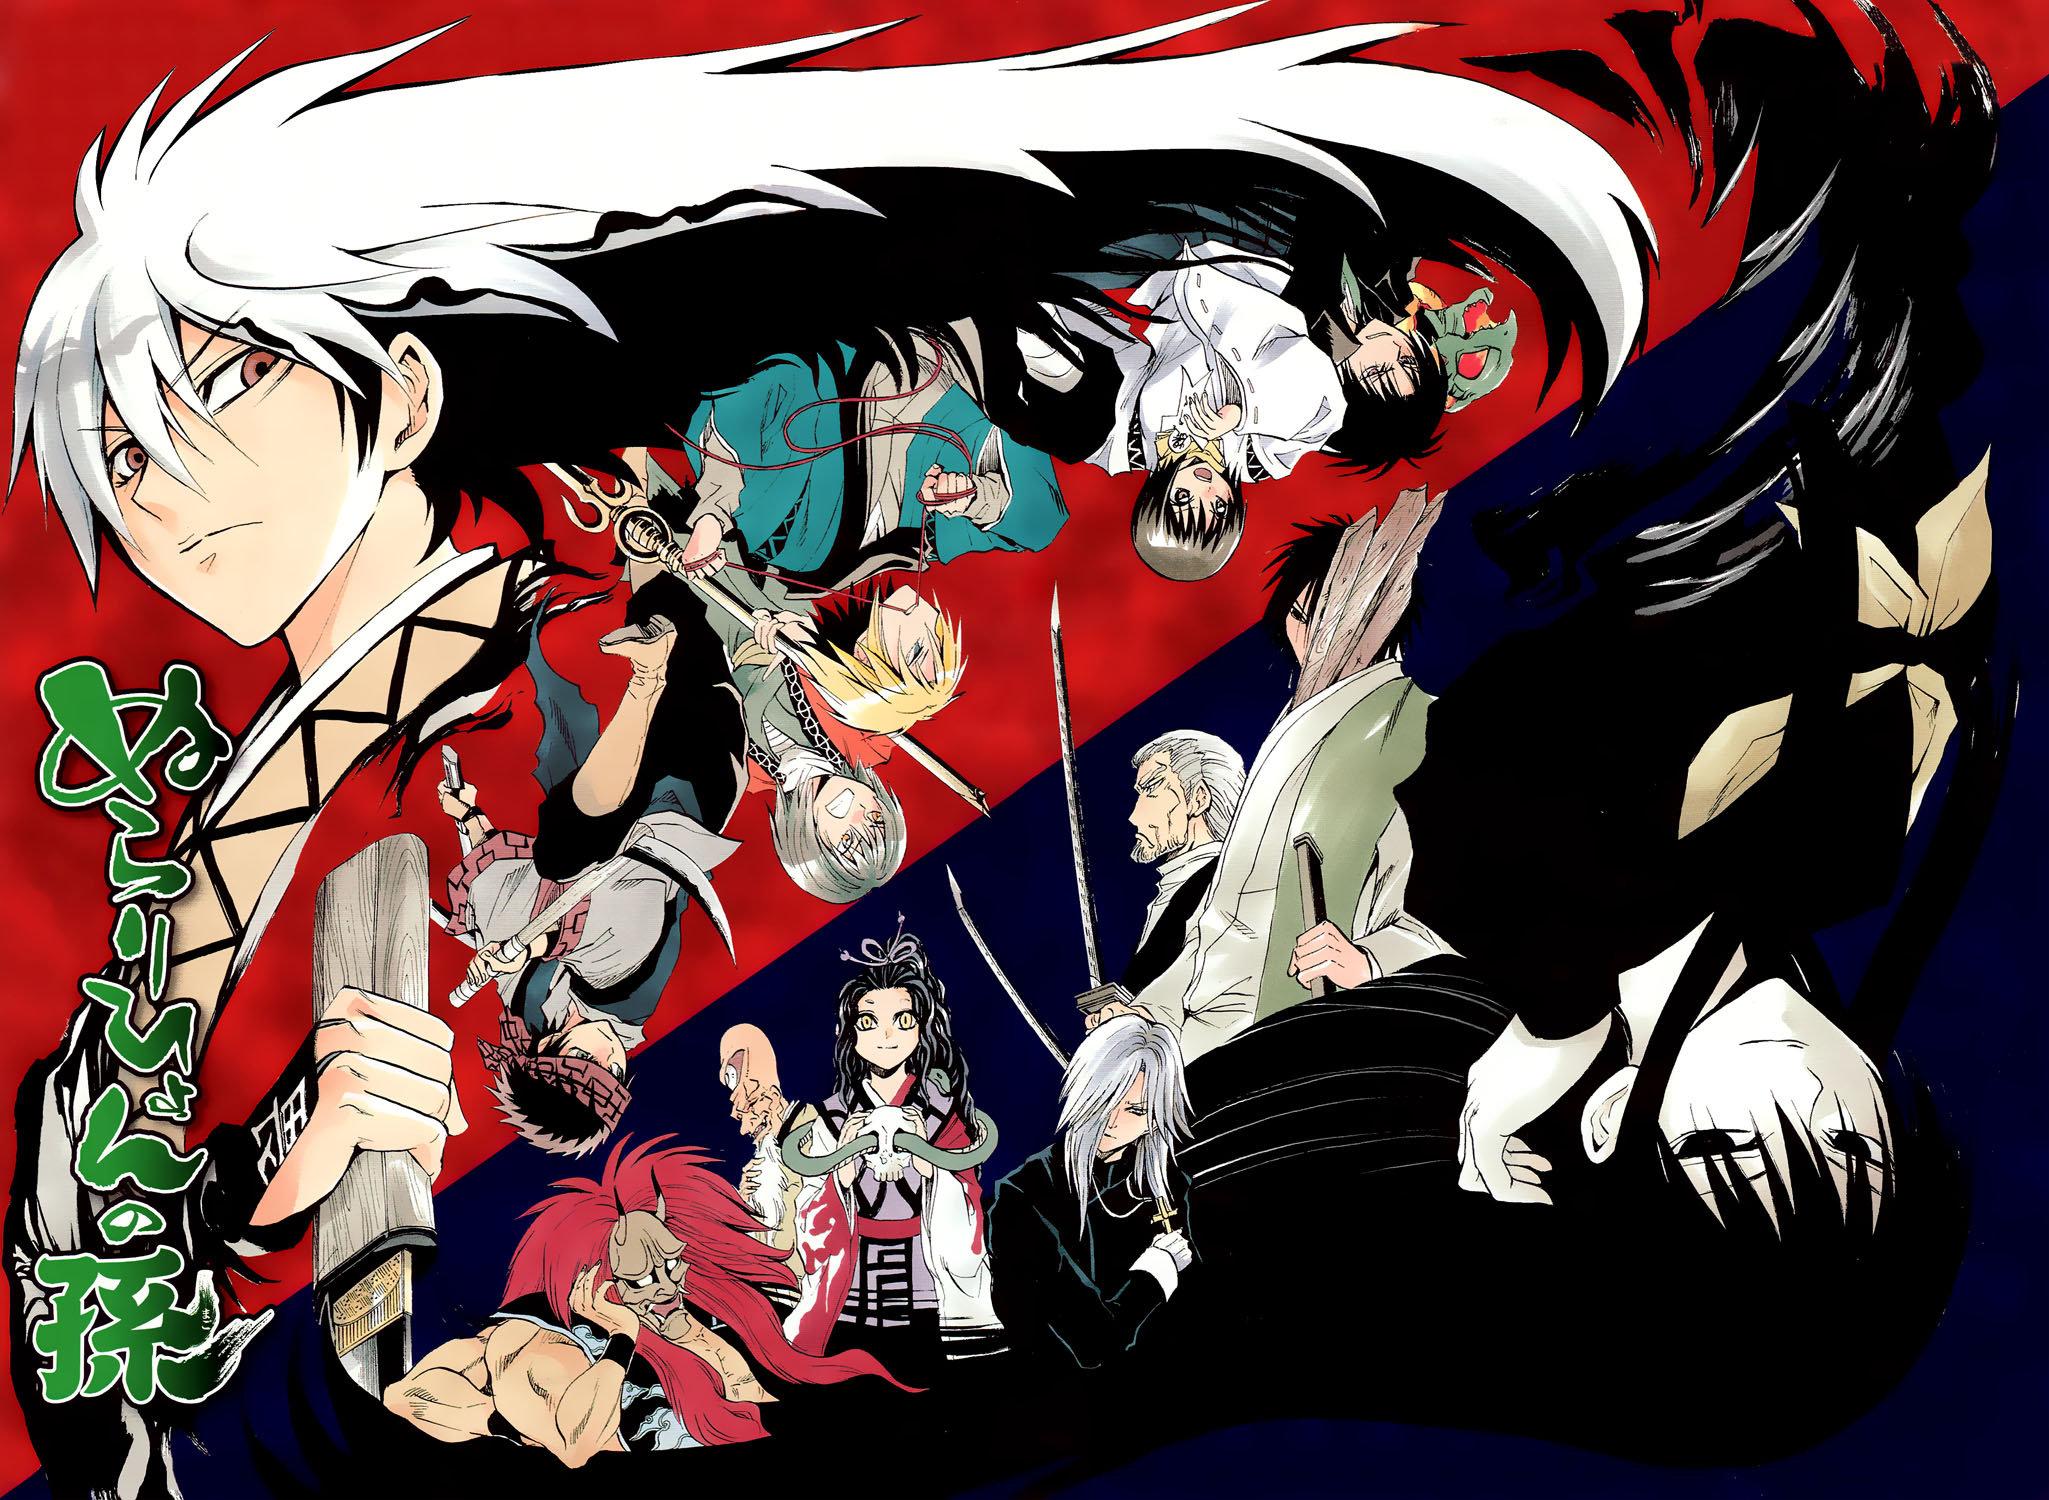 Nurarihyon No Mago (Nura: Rise Of The Yokai Clan) Image